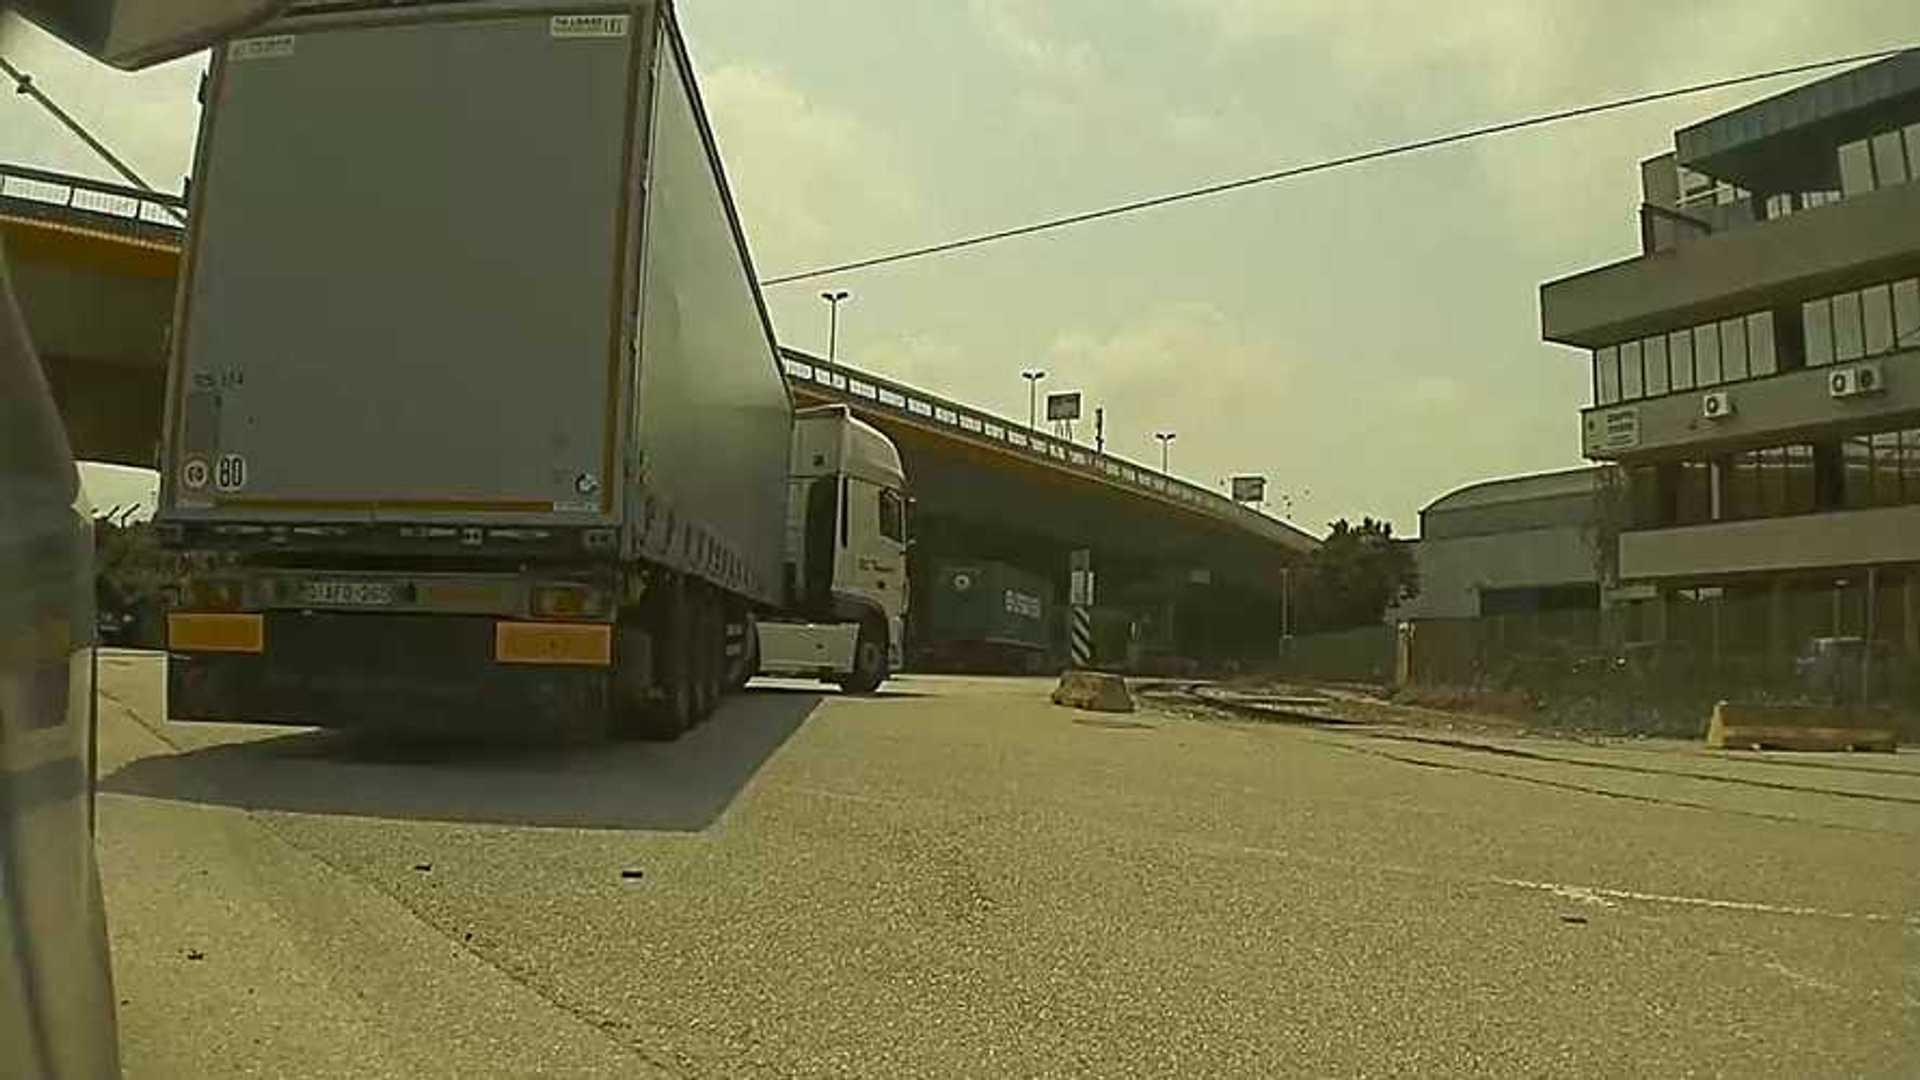 Watch Sentry Mode Capture Semi Truck Damaging Tesla Model 3: Video